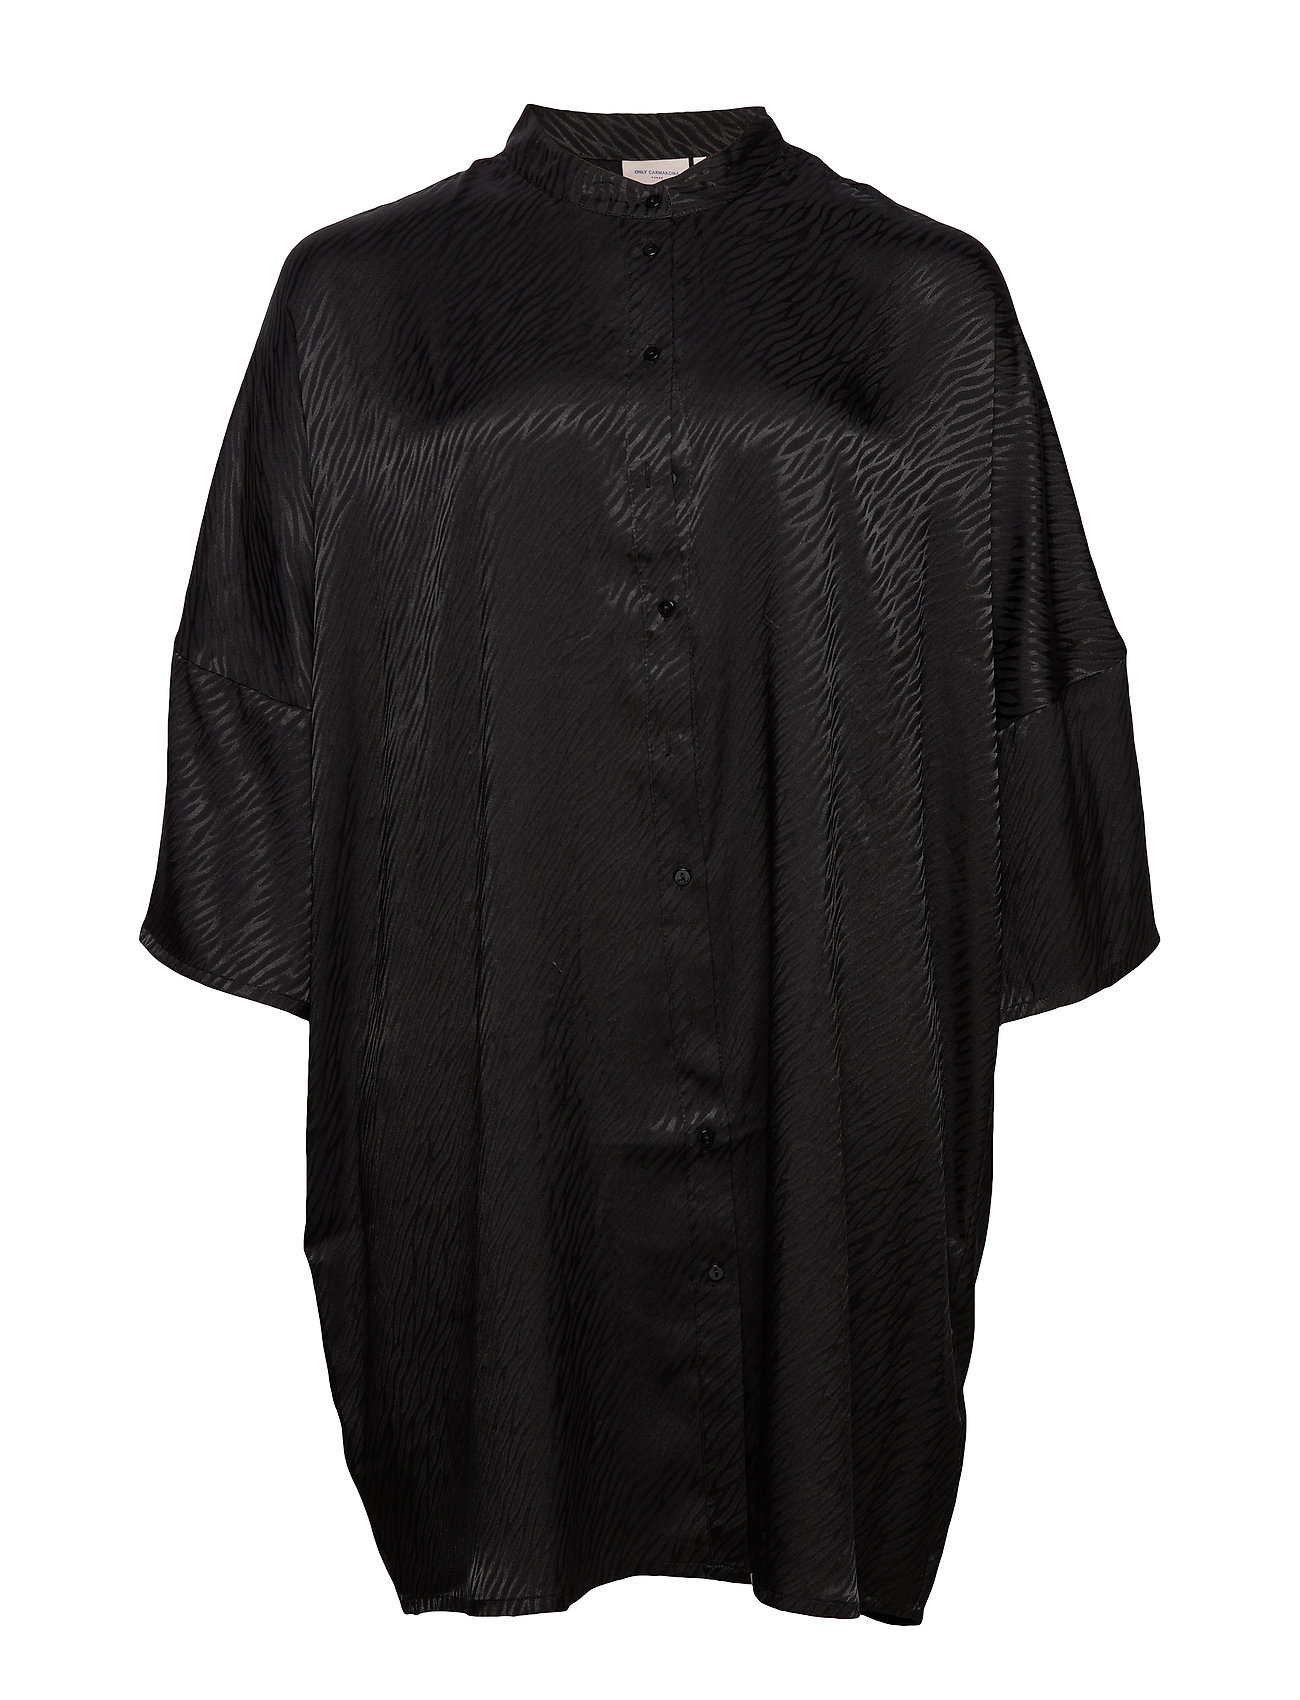 ONLY Carmakoma CARLEONORA 3/4 SL TUNIC SHIRT DRESS - BLACK